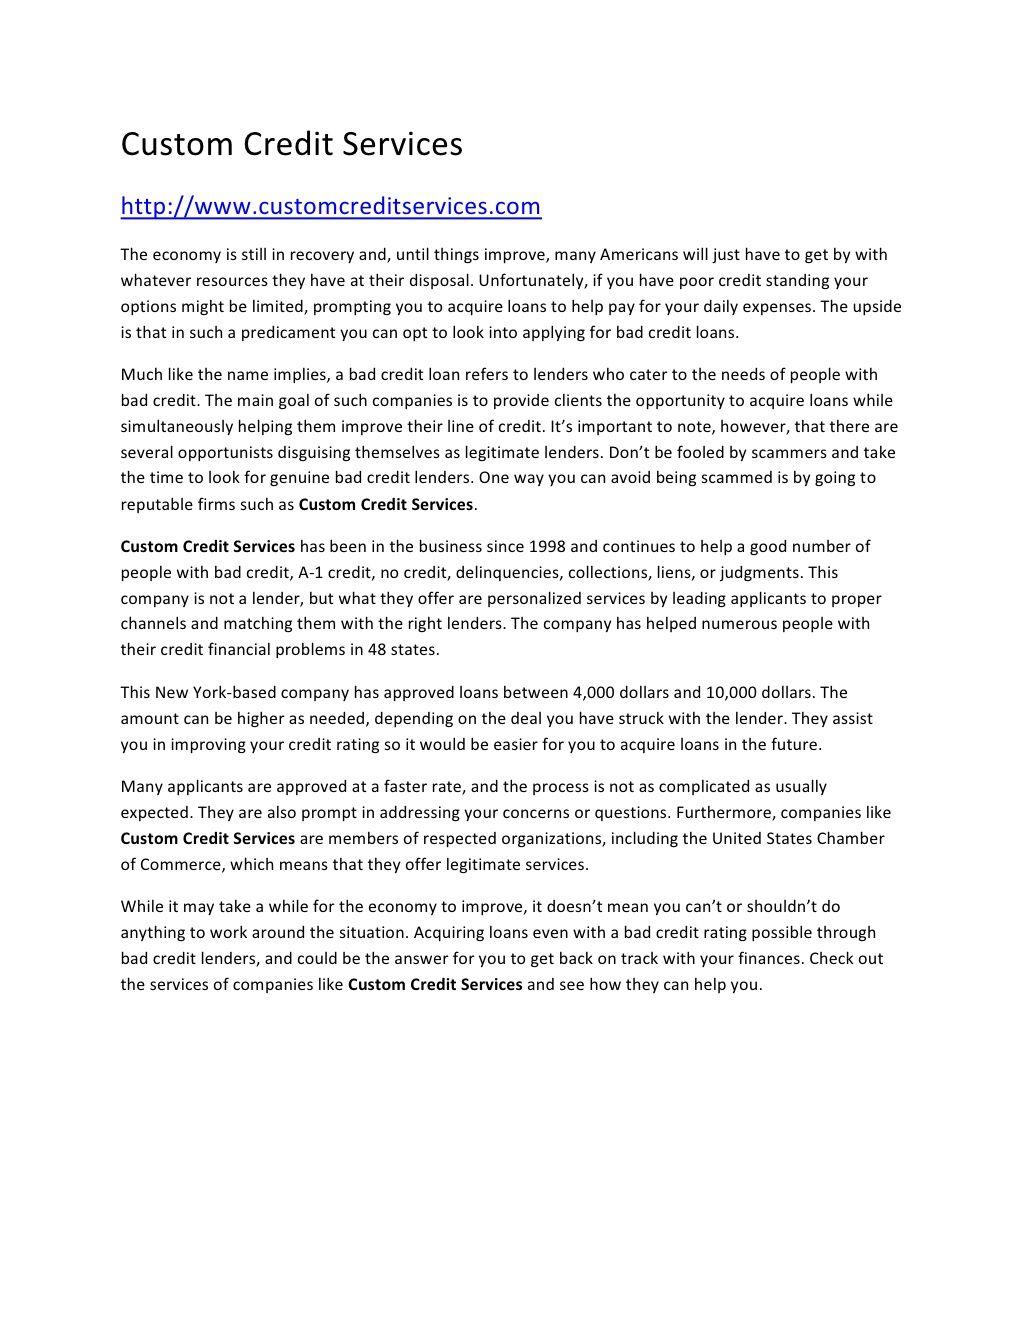 Custom Credit Services By Ricky James Via Slideshare